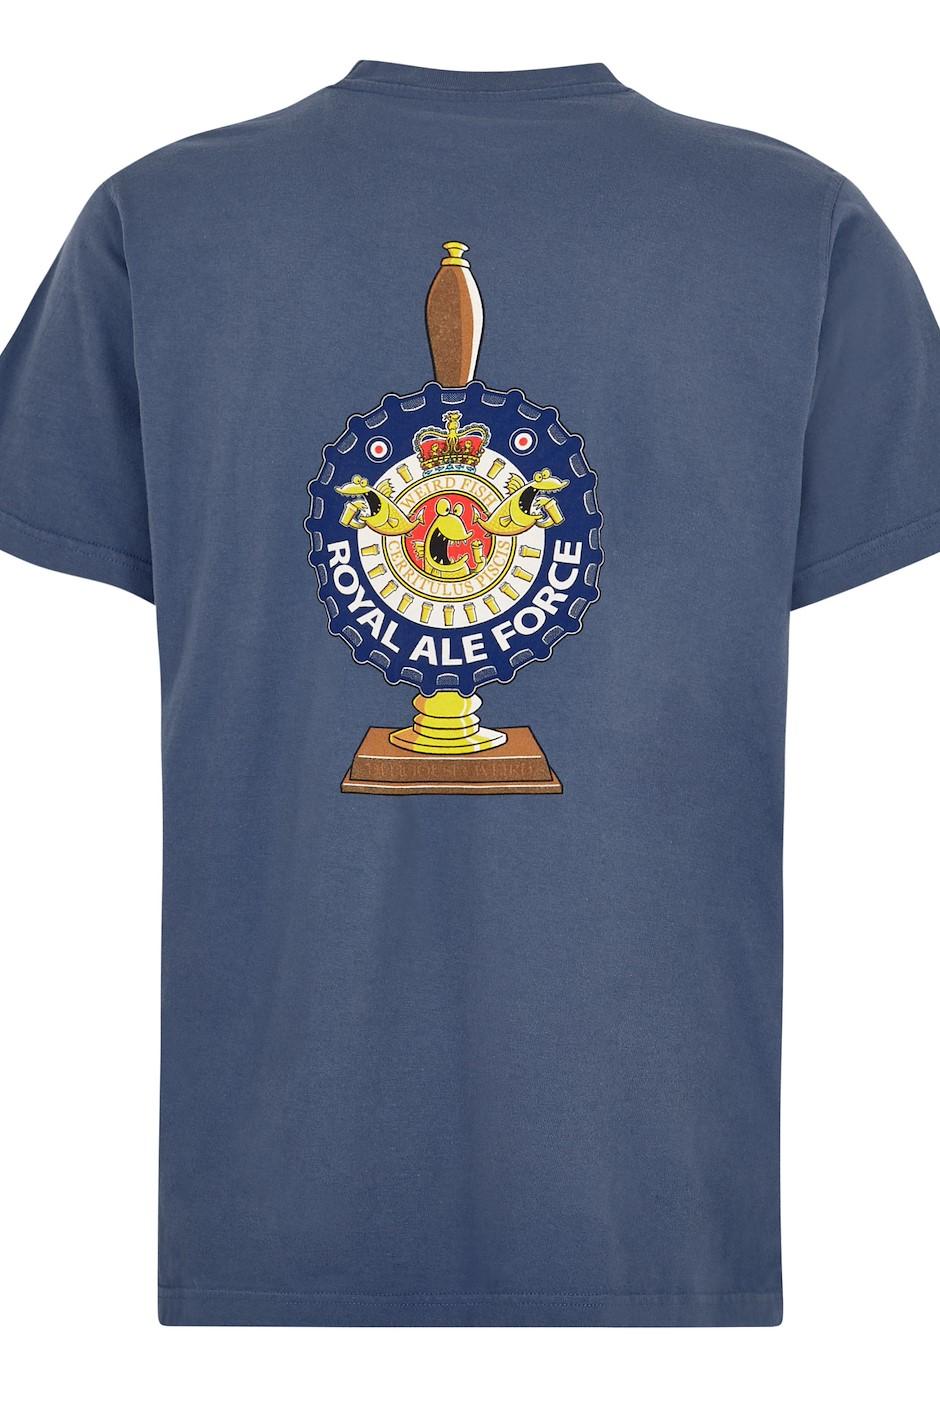 Royal Ale Force Artist T-Shirt Blue Indigo